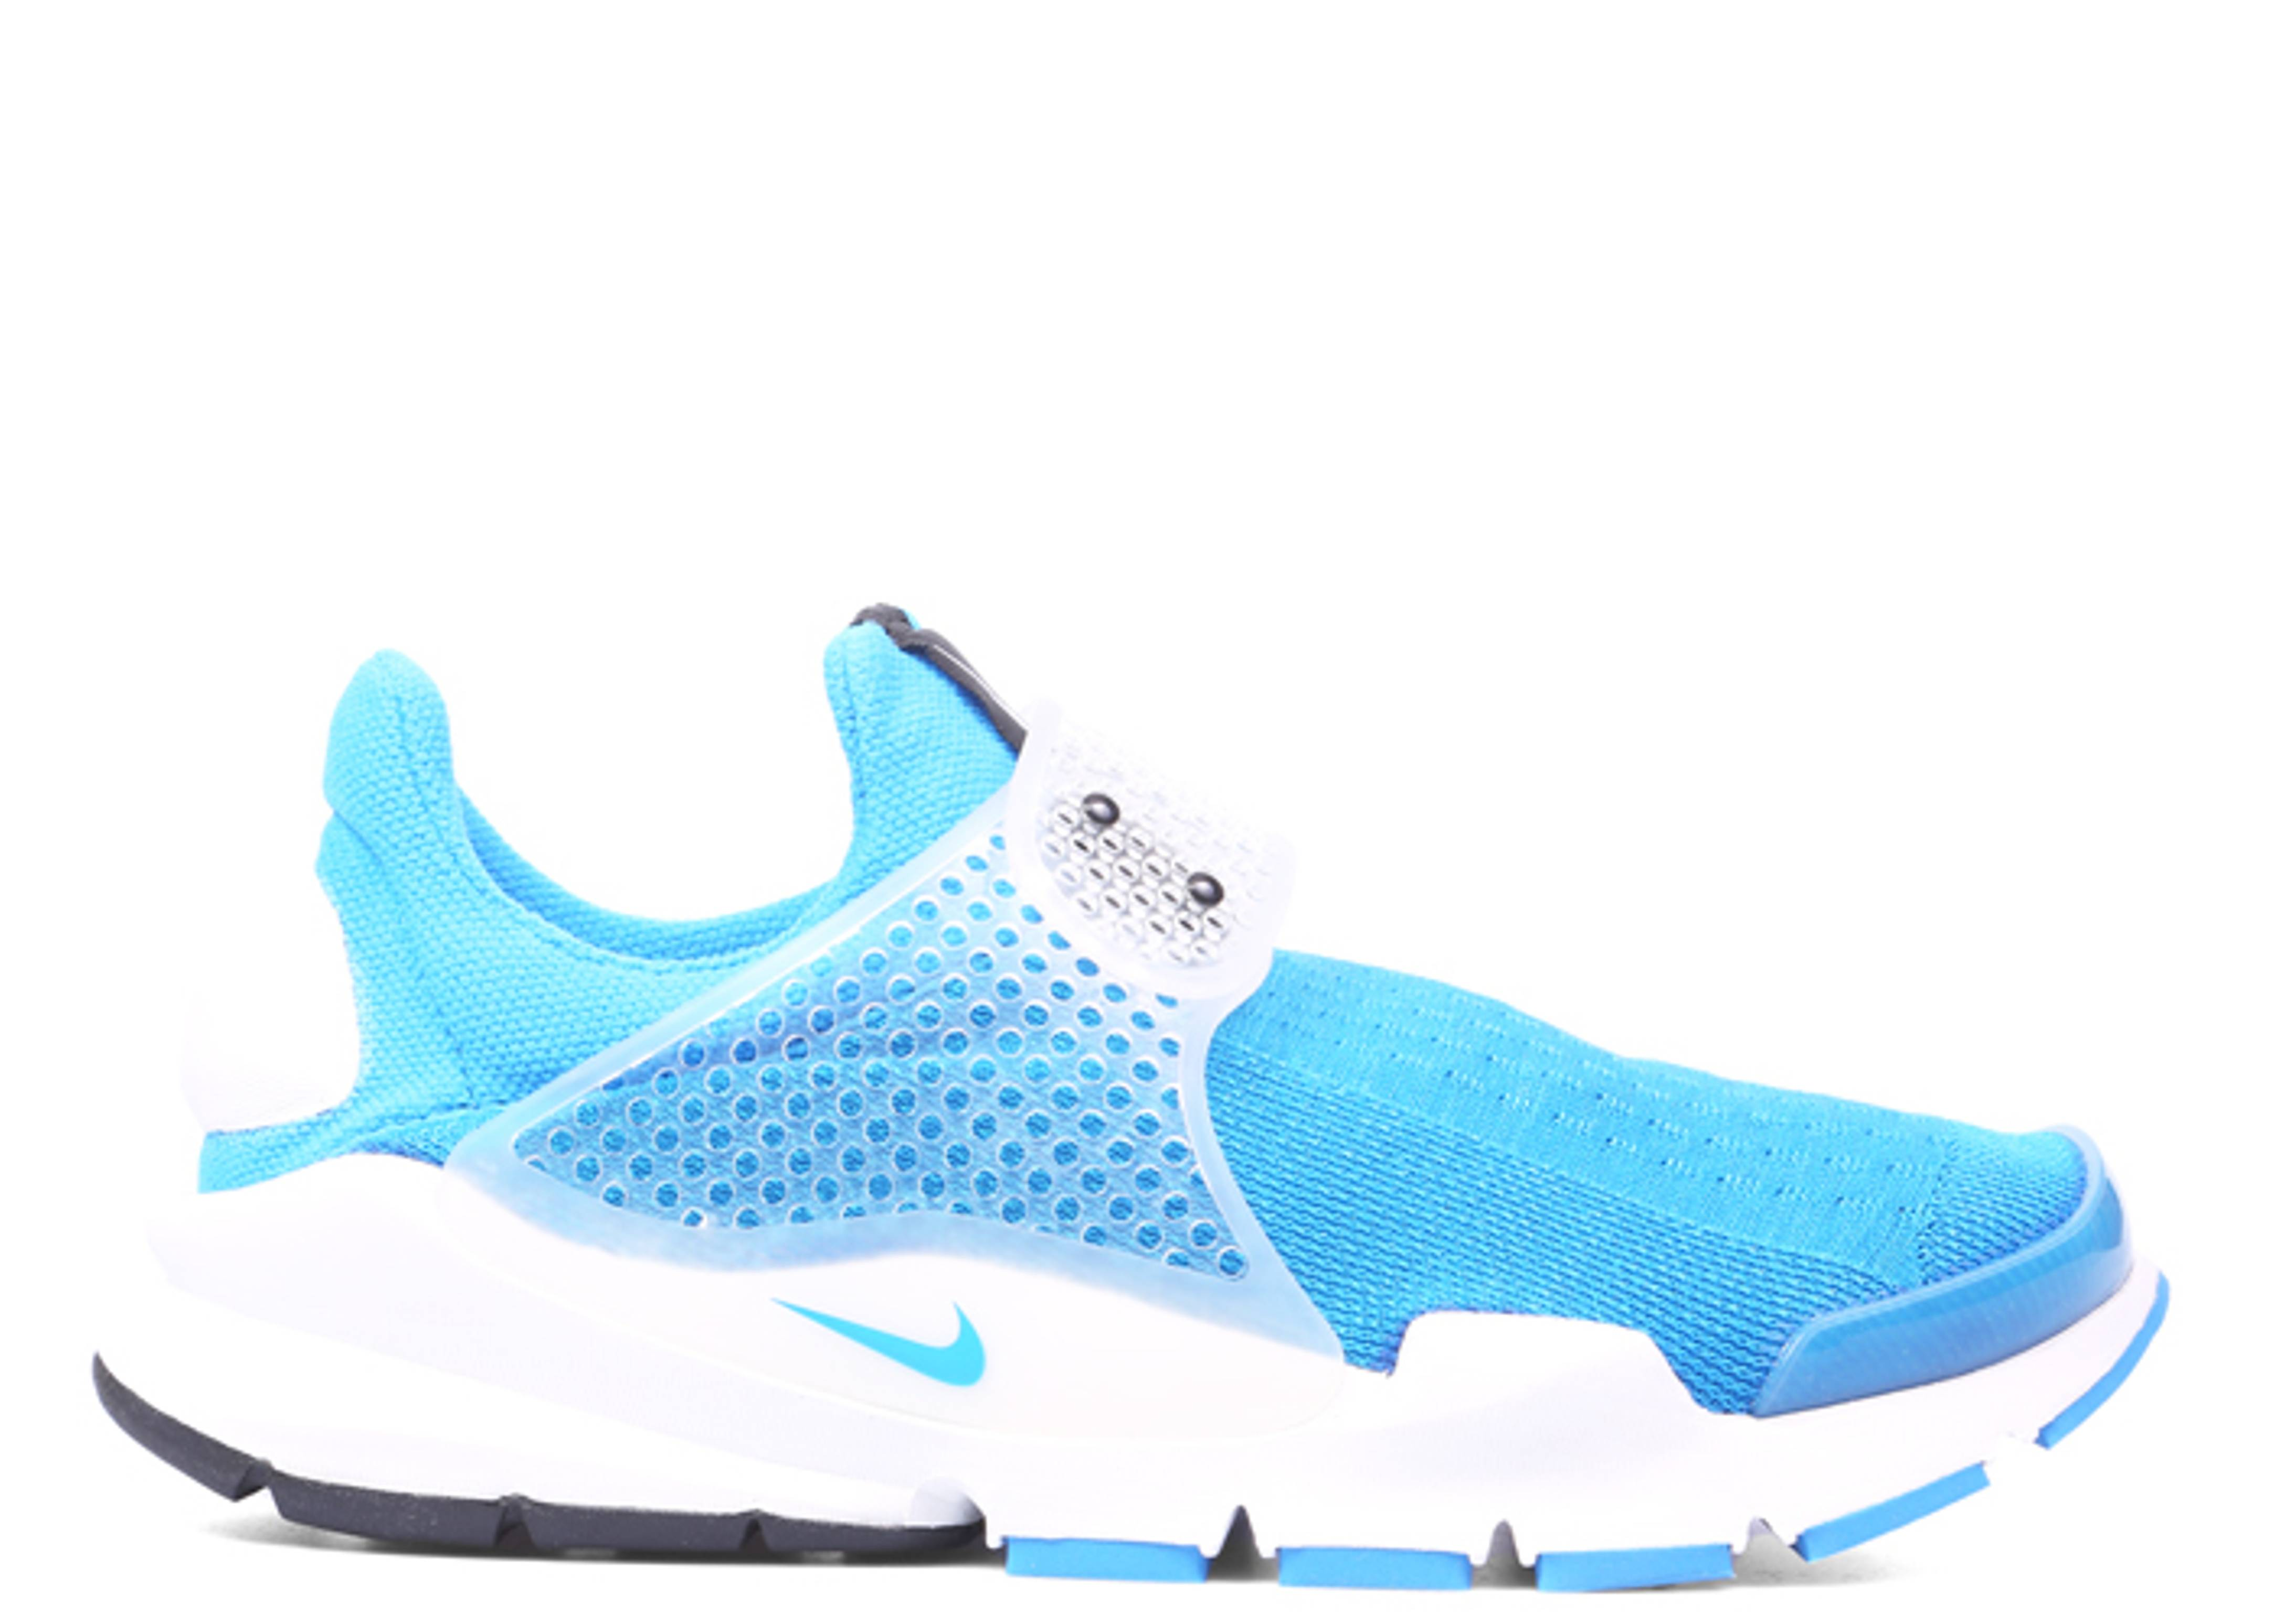 a702c63e Sock Dart Sp / Fragment - Nike - 728748 401 - photo blue/summit ...